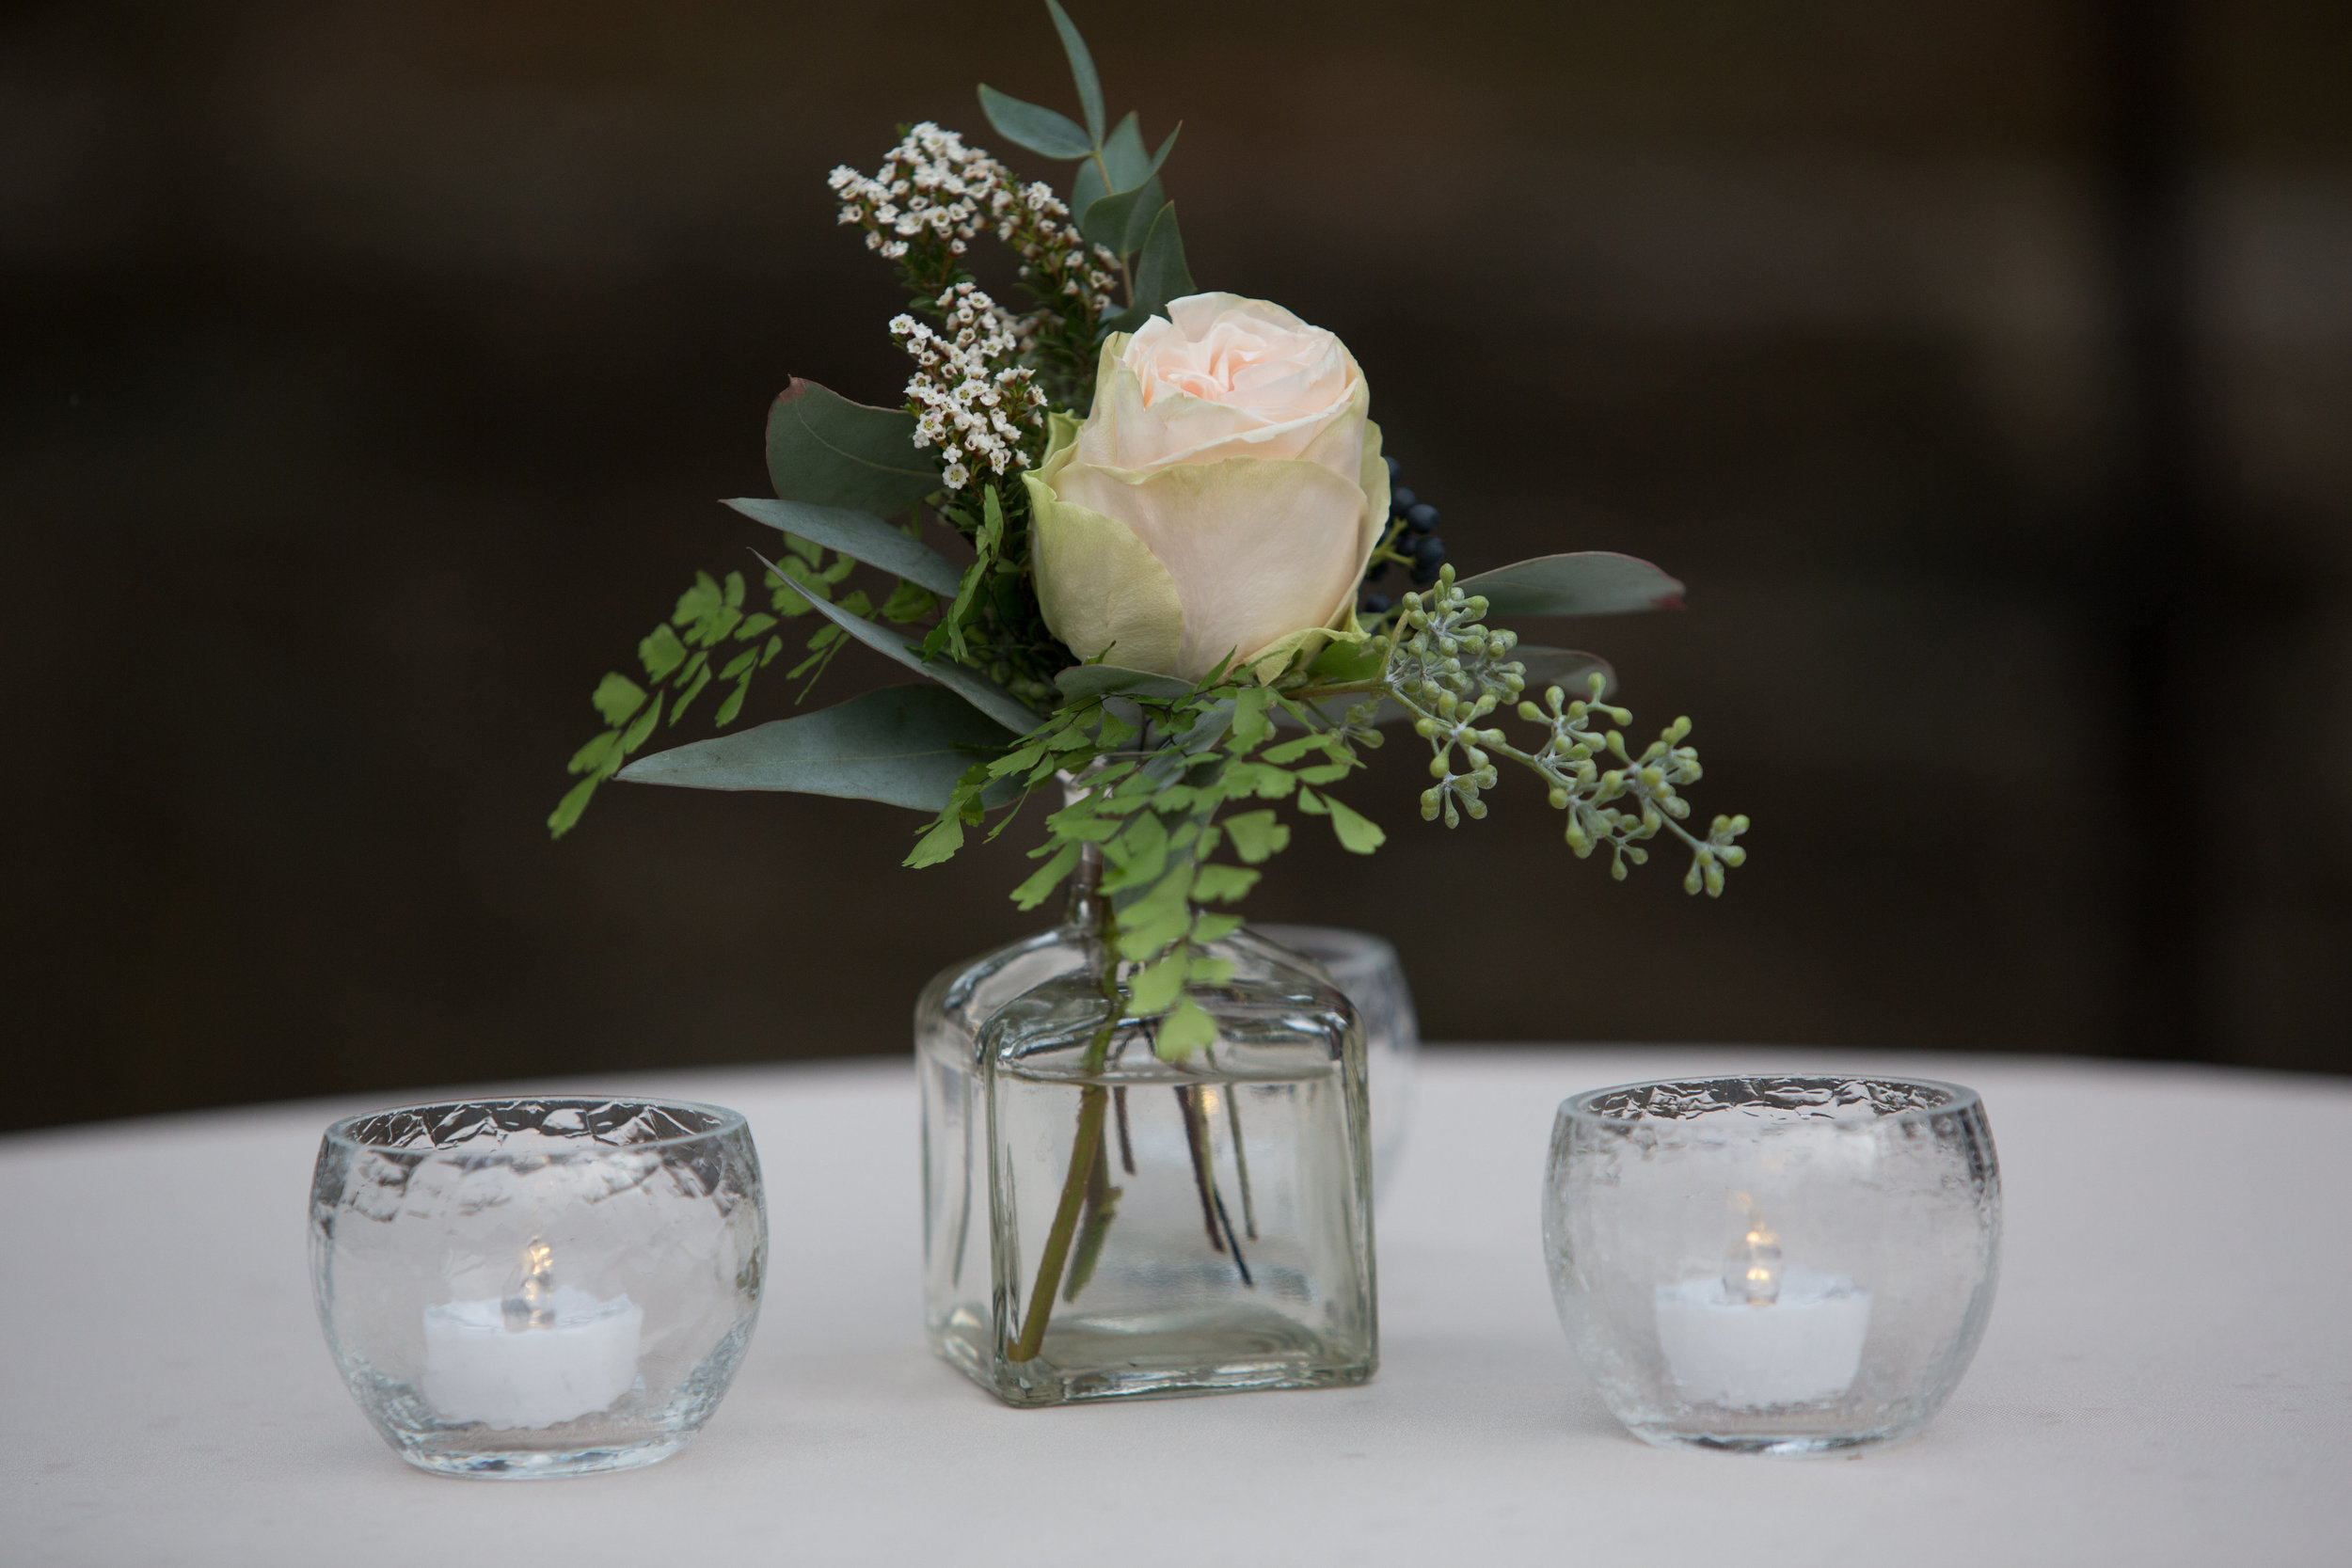 Maidenhair fern and garden rose bud vase // Nashville Florist